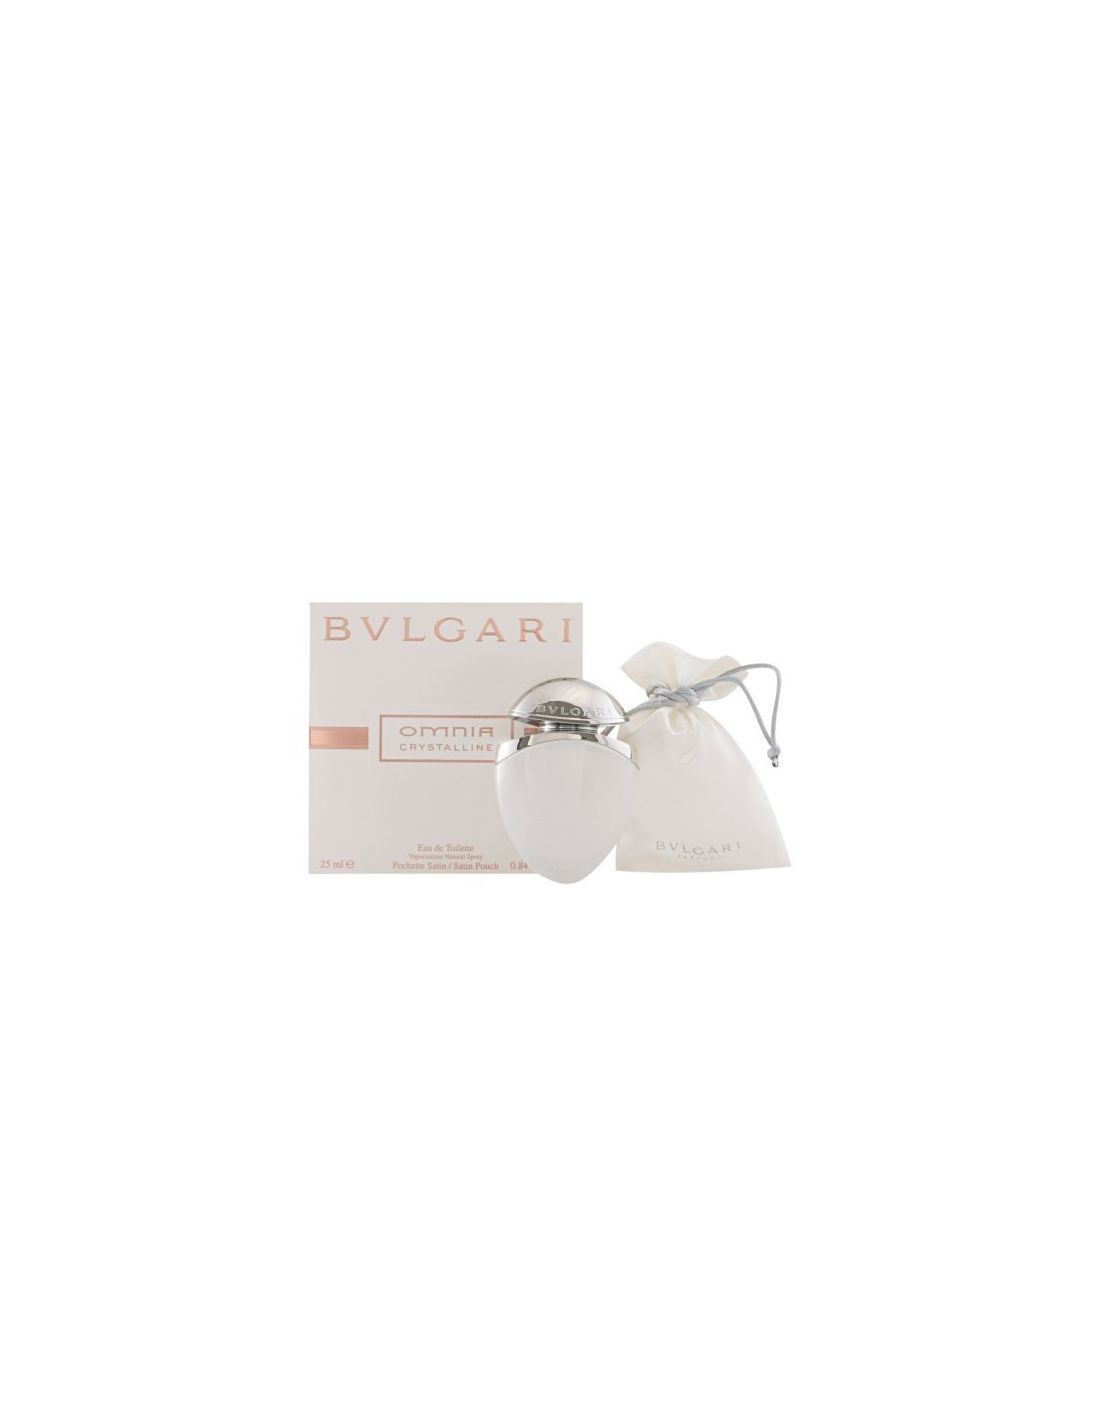 Perfume Omnia Crystalline Eau de Toilette Satin Pouch 25 ml ... 35ae2297d1